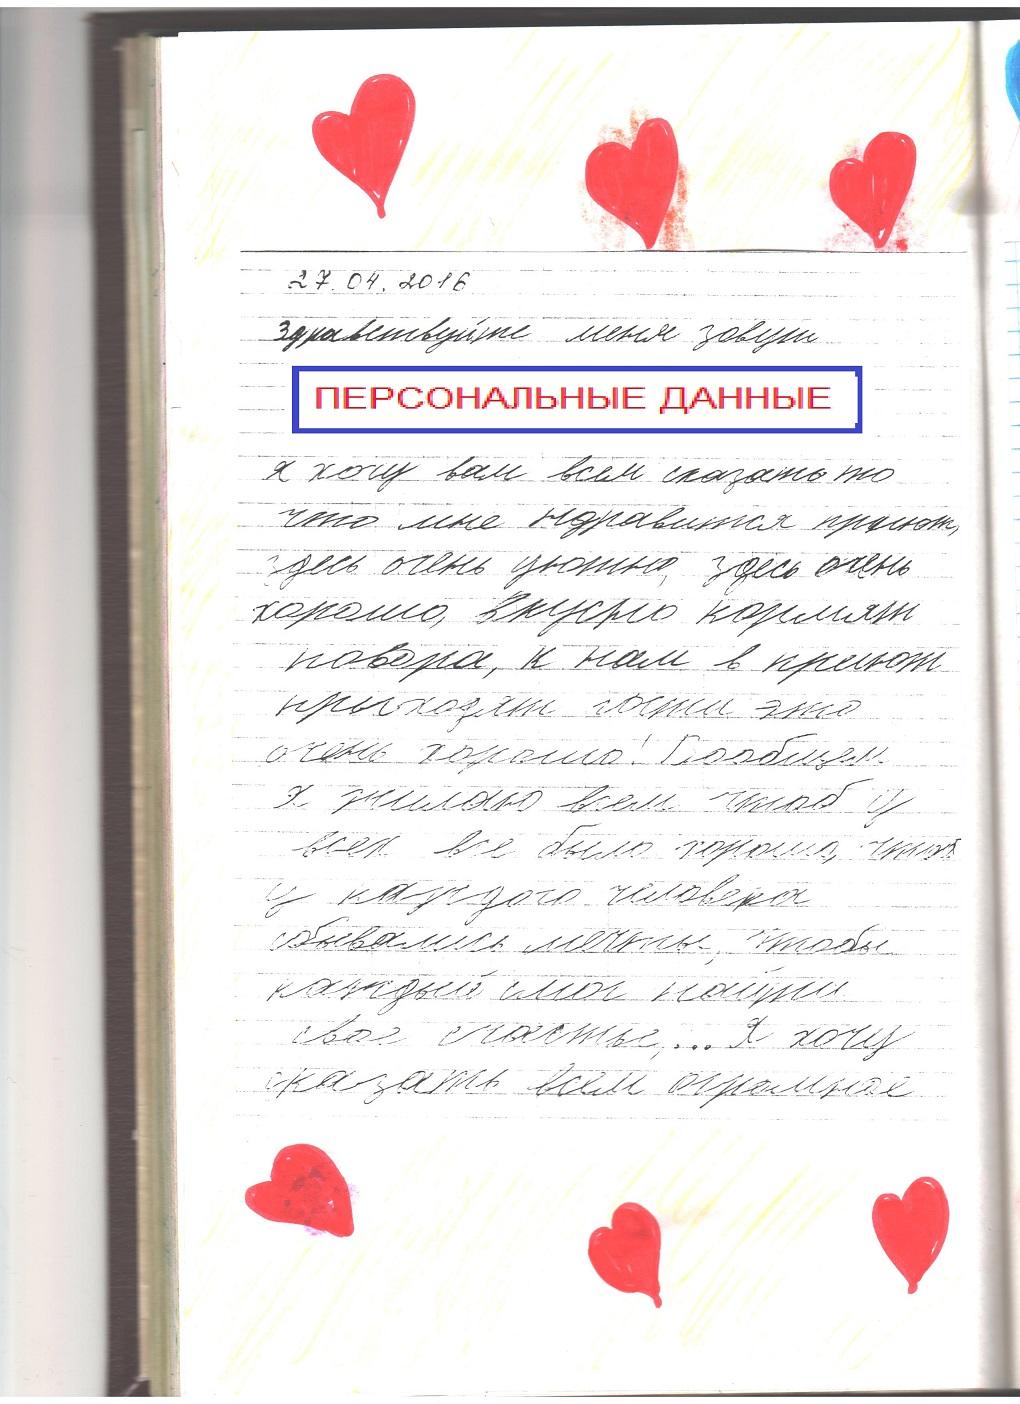 sp_27.04.2016